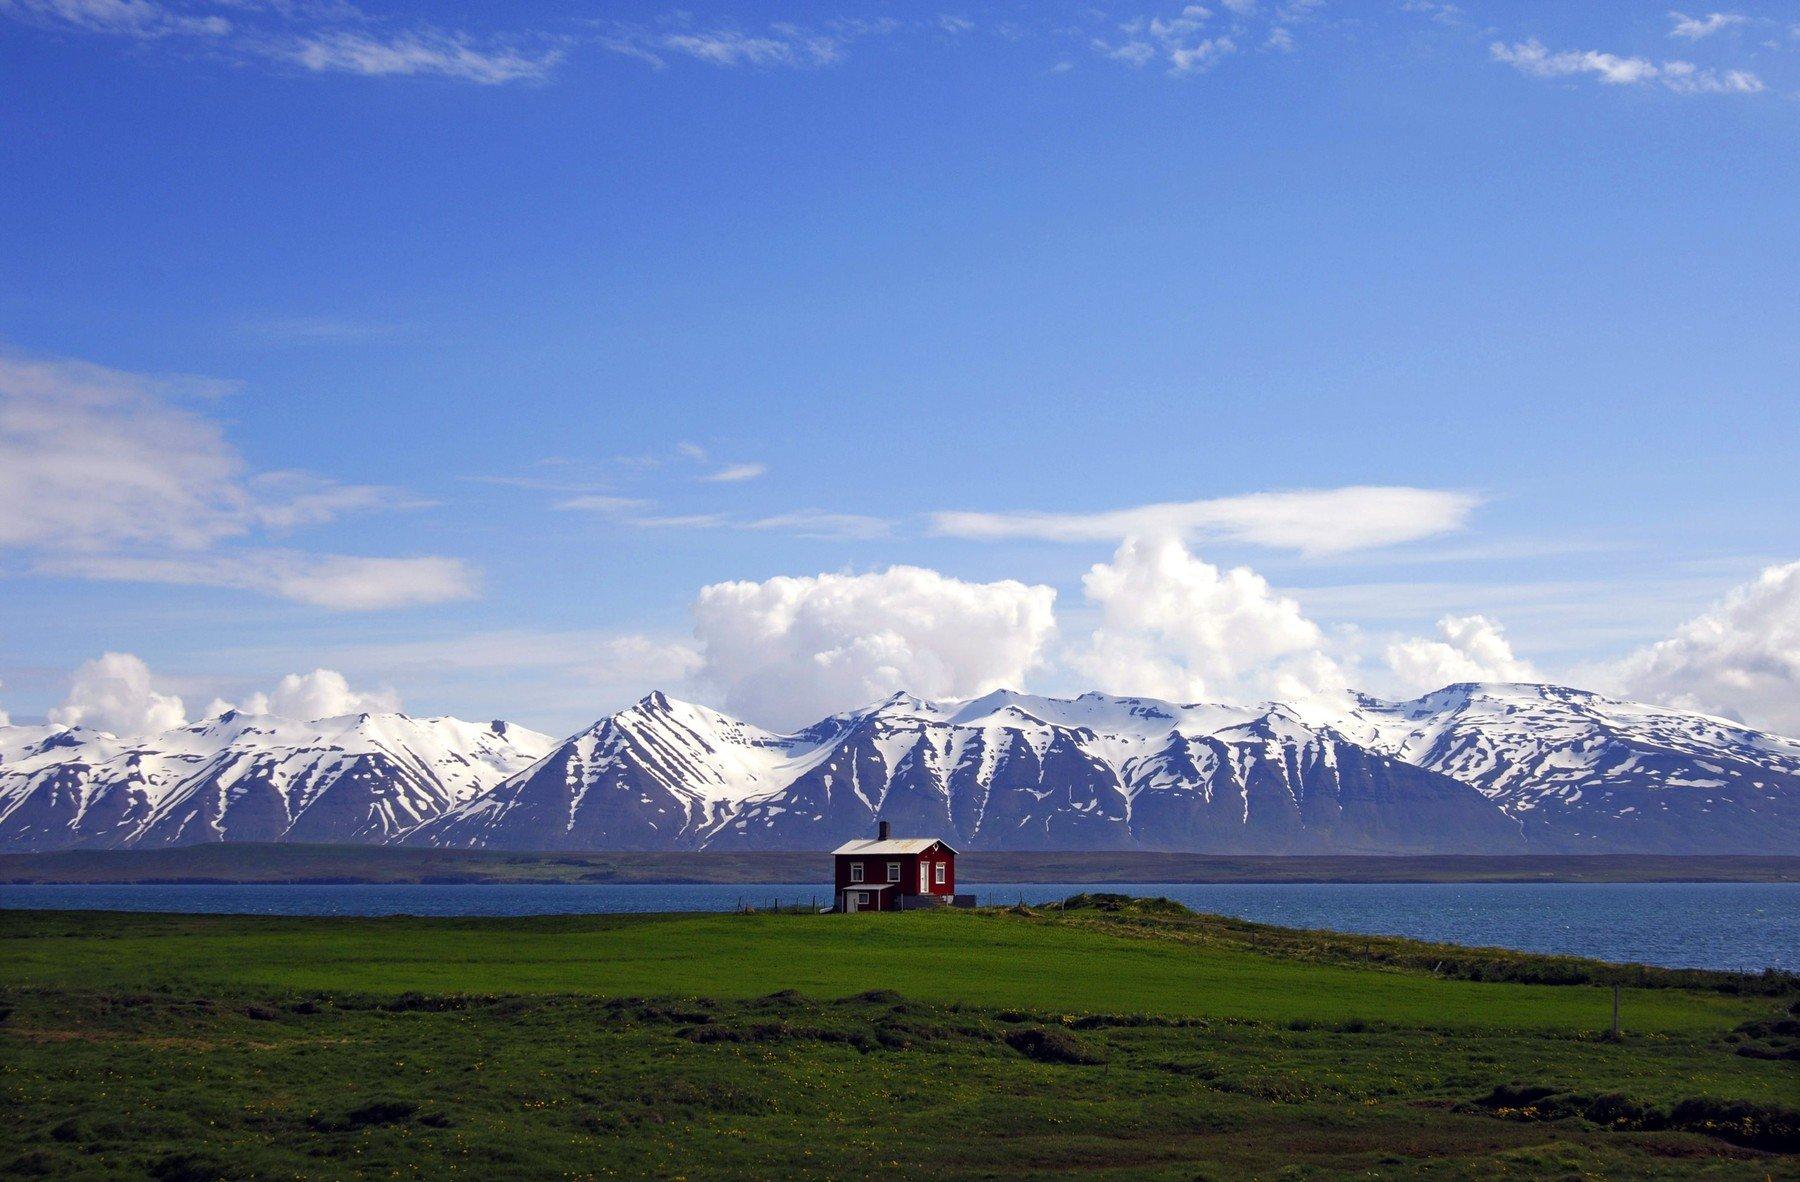 islandski krajolik